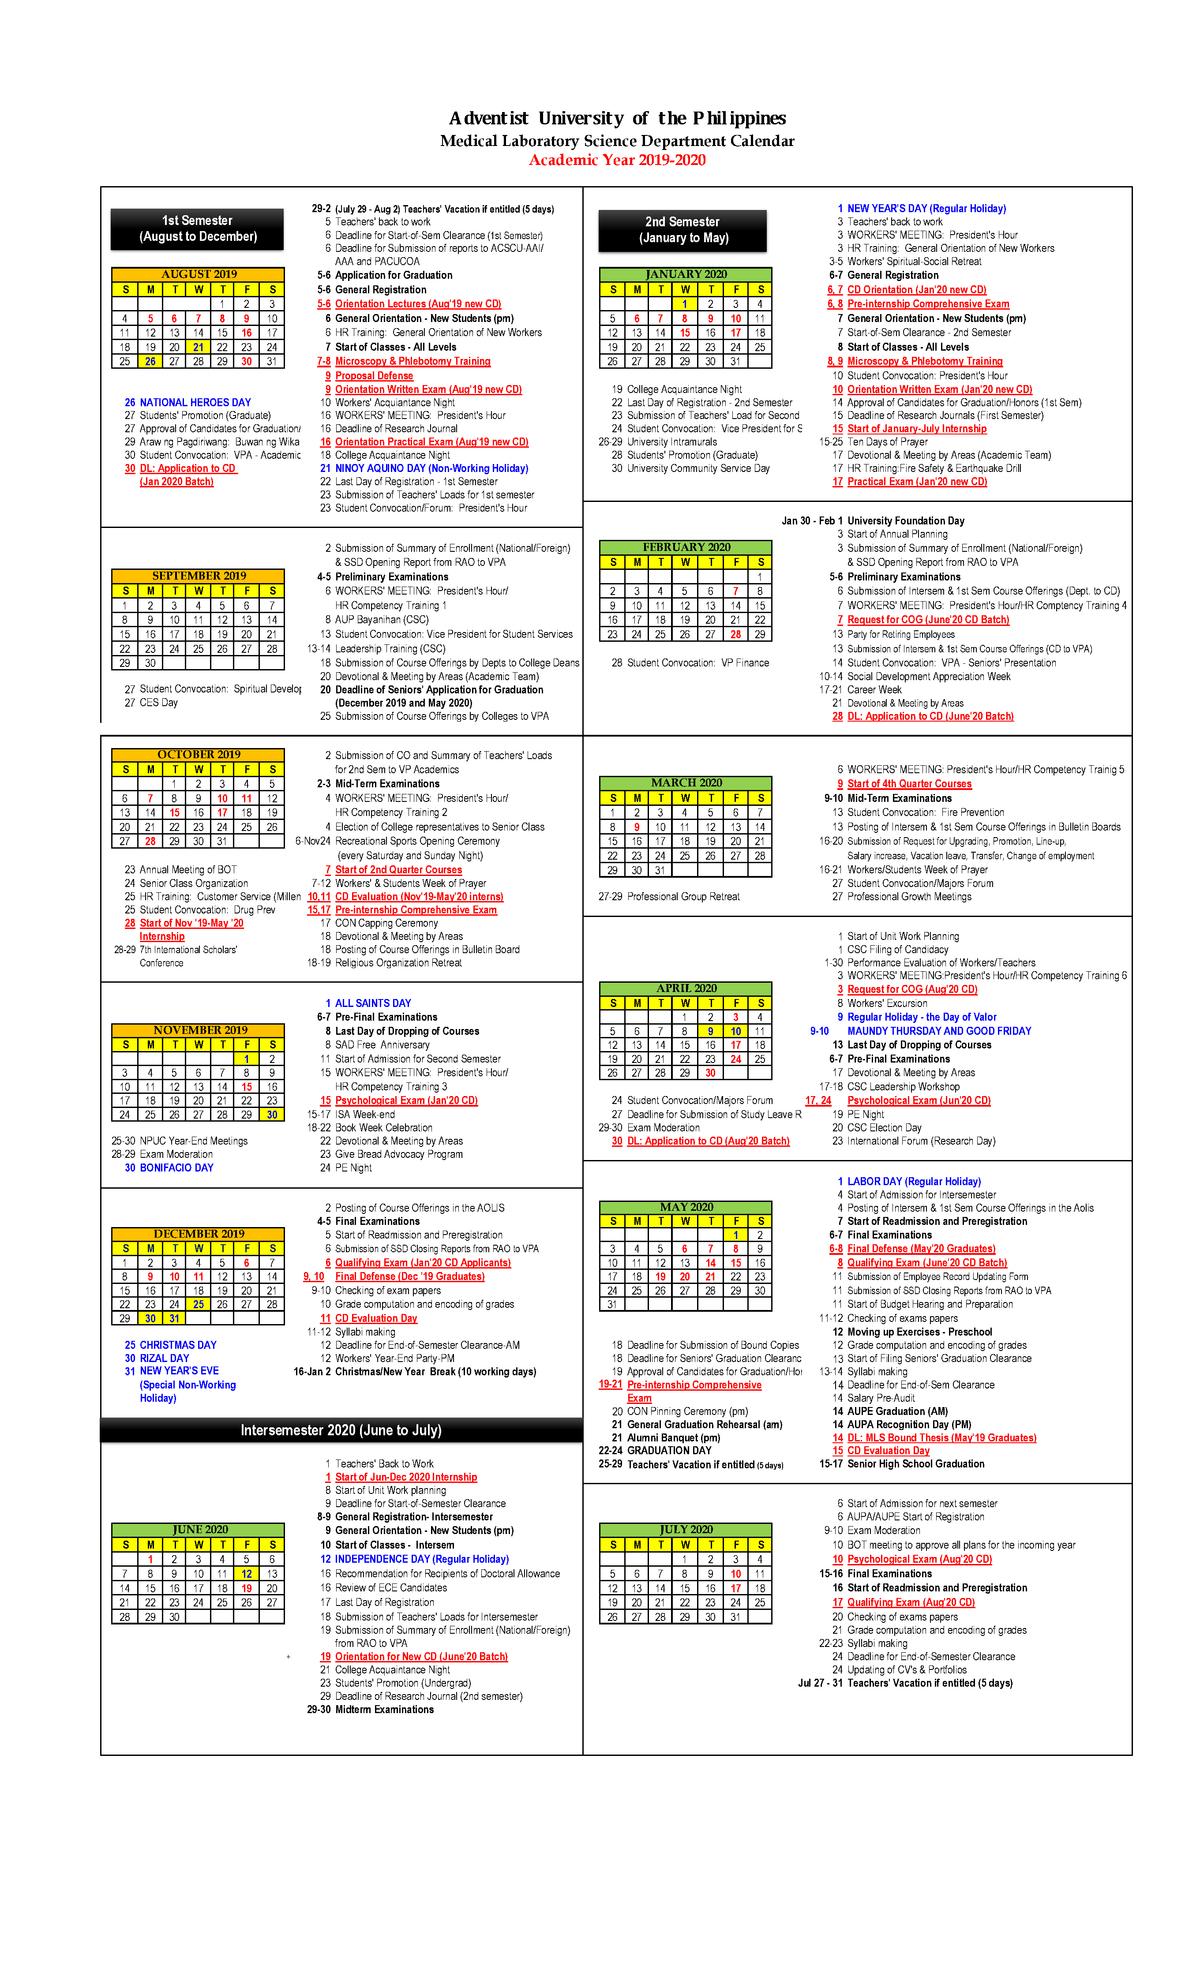 Aup Mls Academic Calendar 2019-2020 - - Studocu